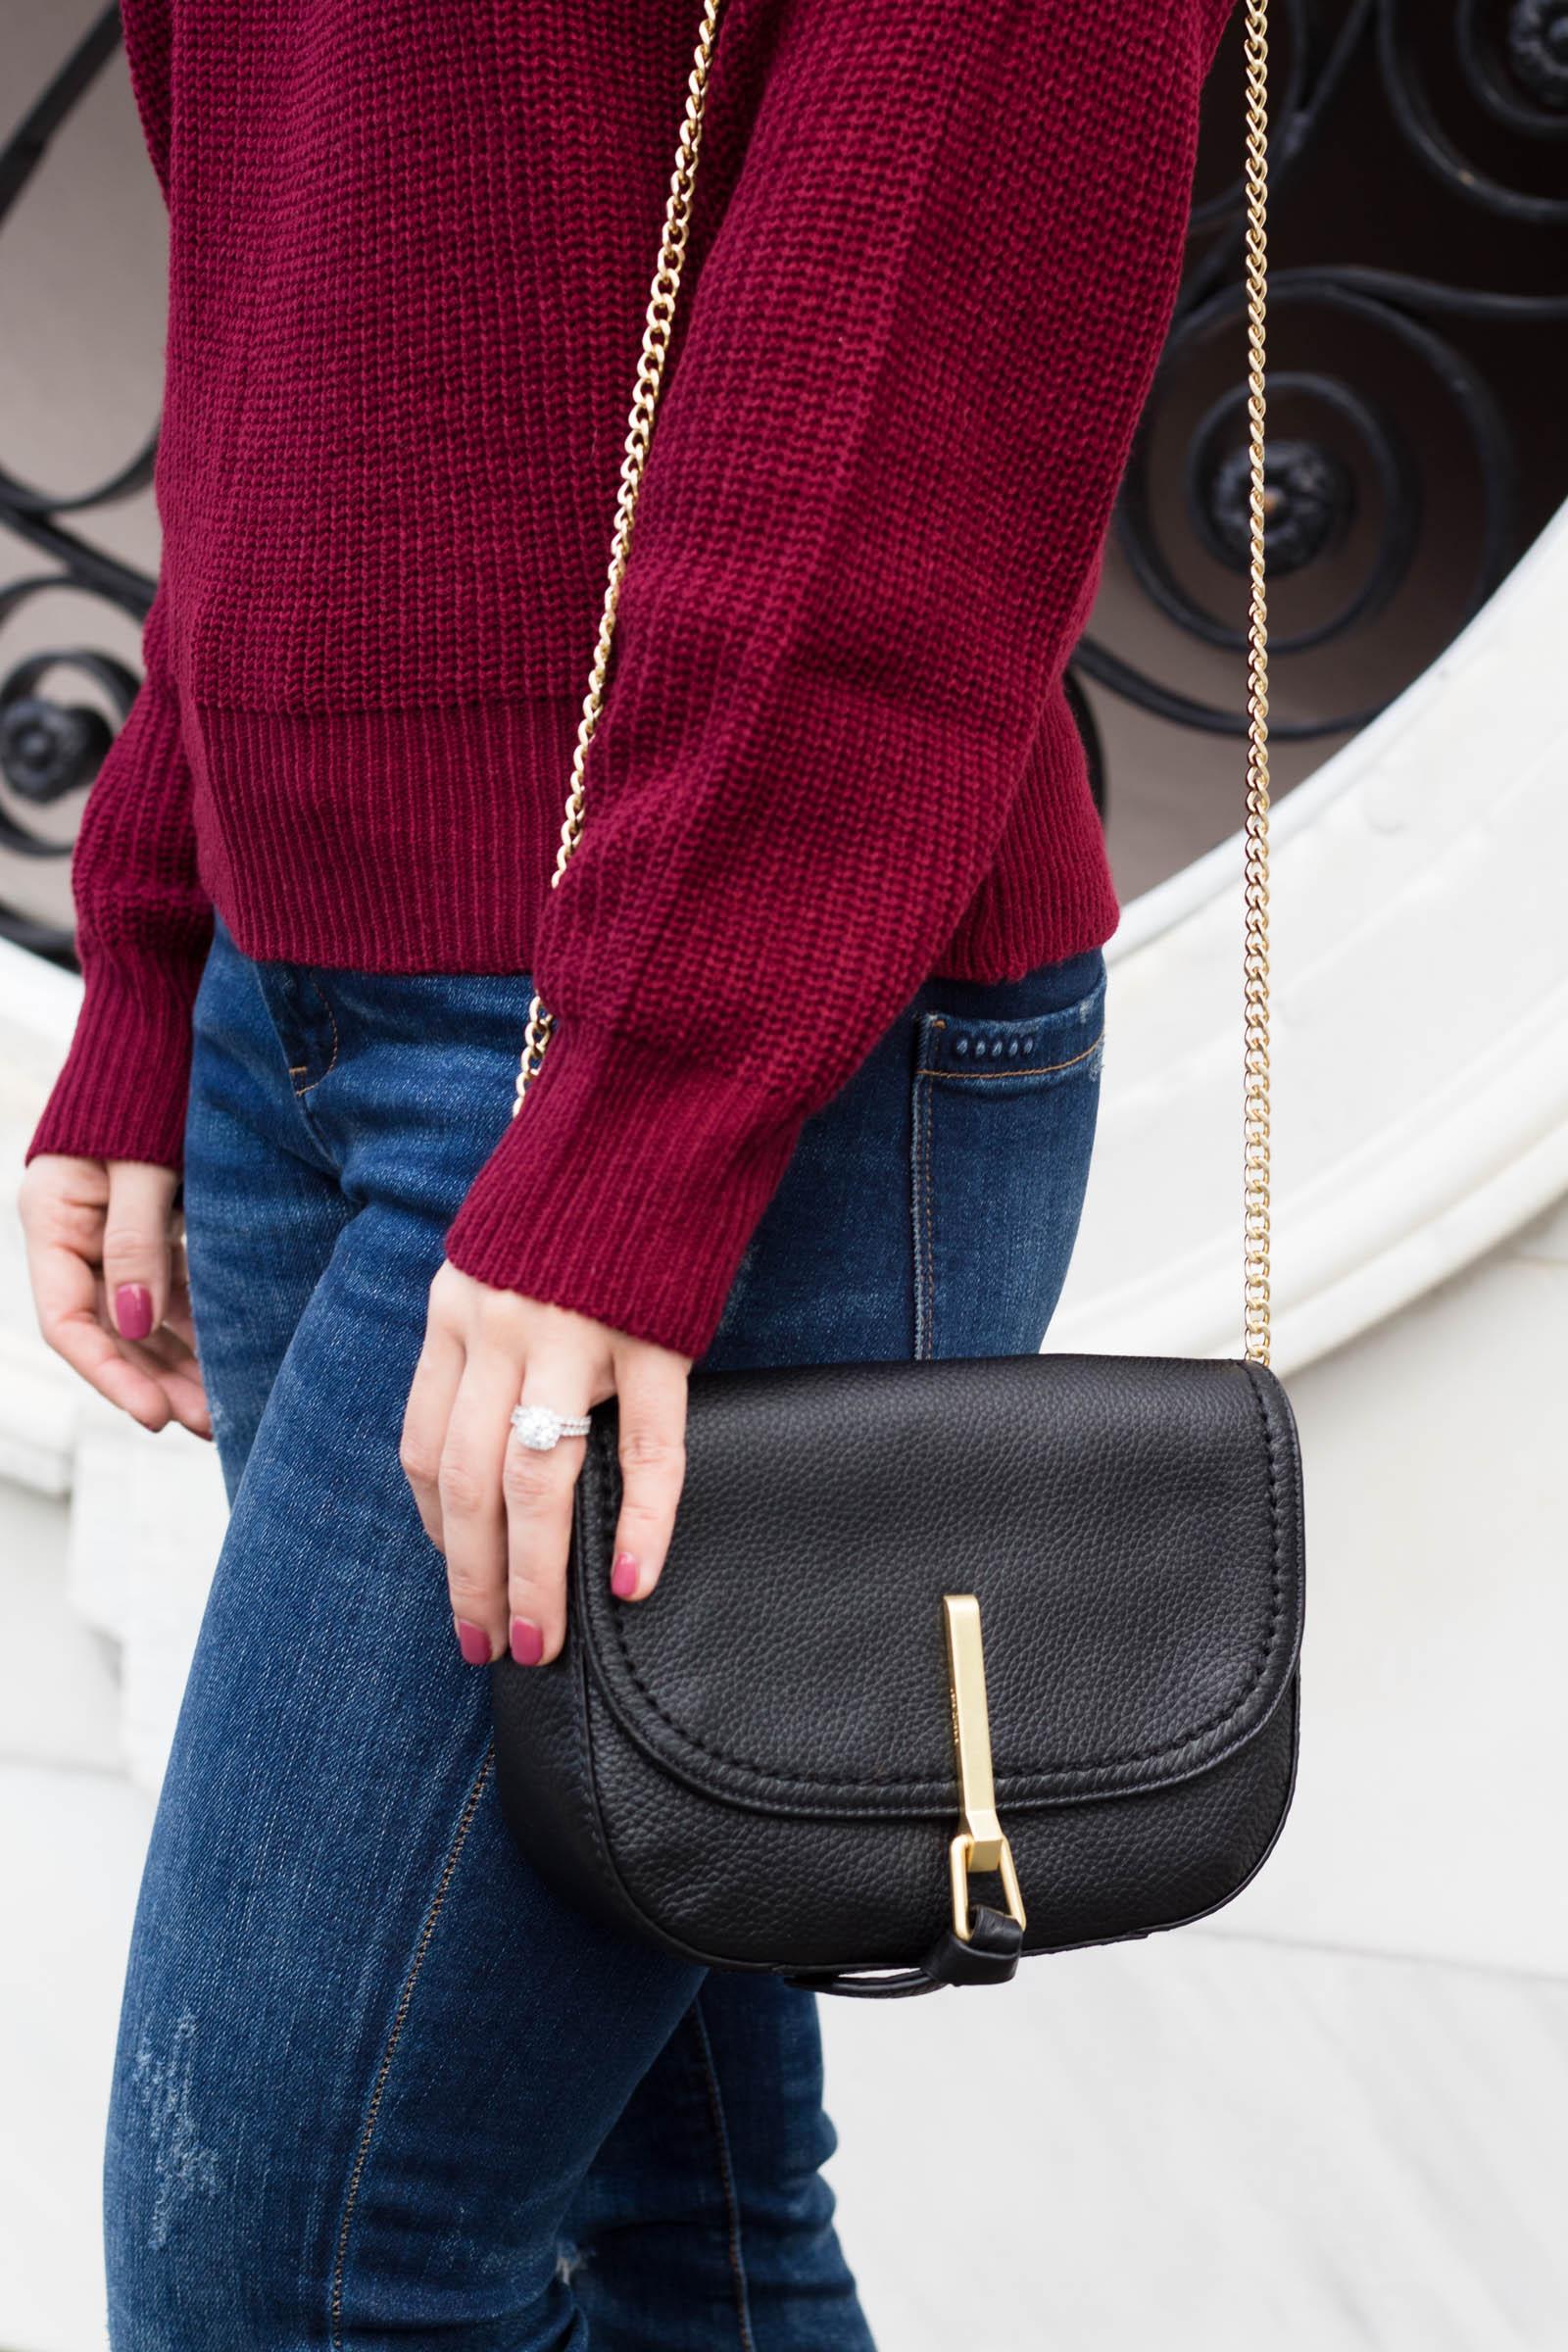 vera bradley carson mini saddle bag, black crossbody bag